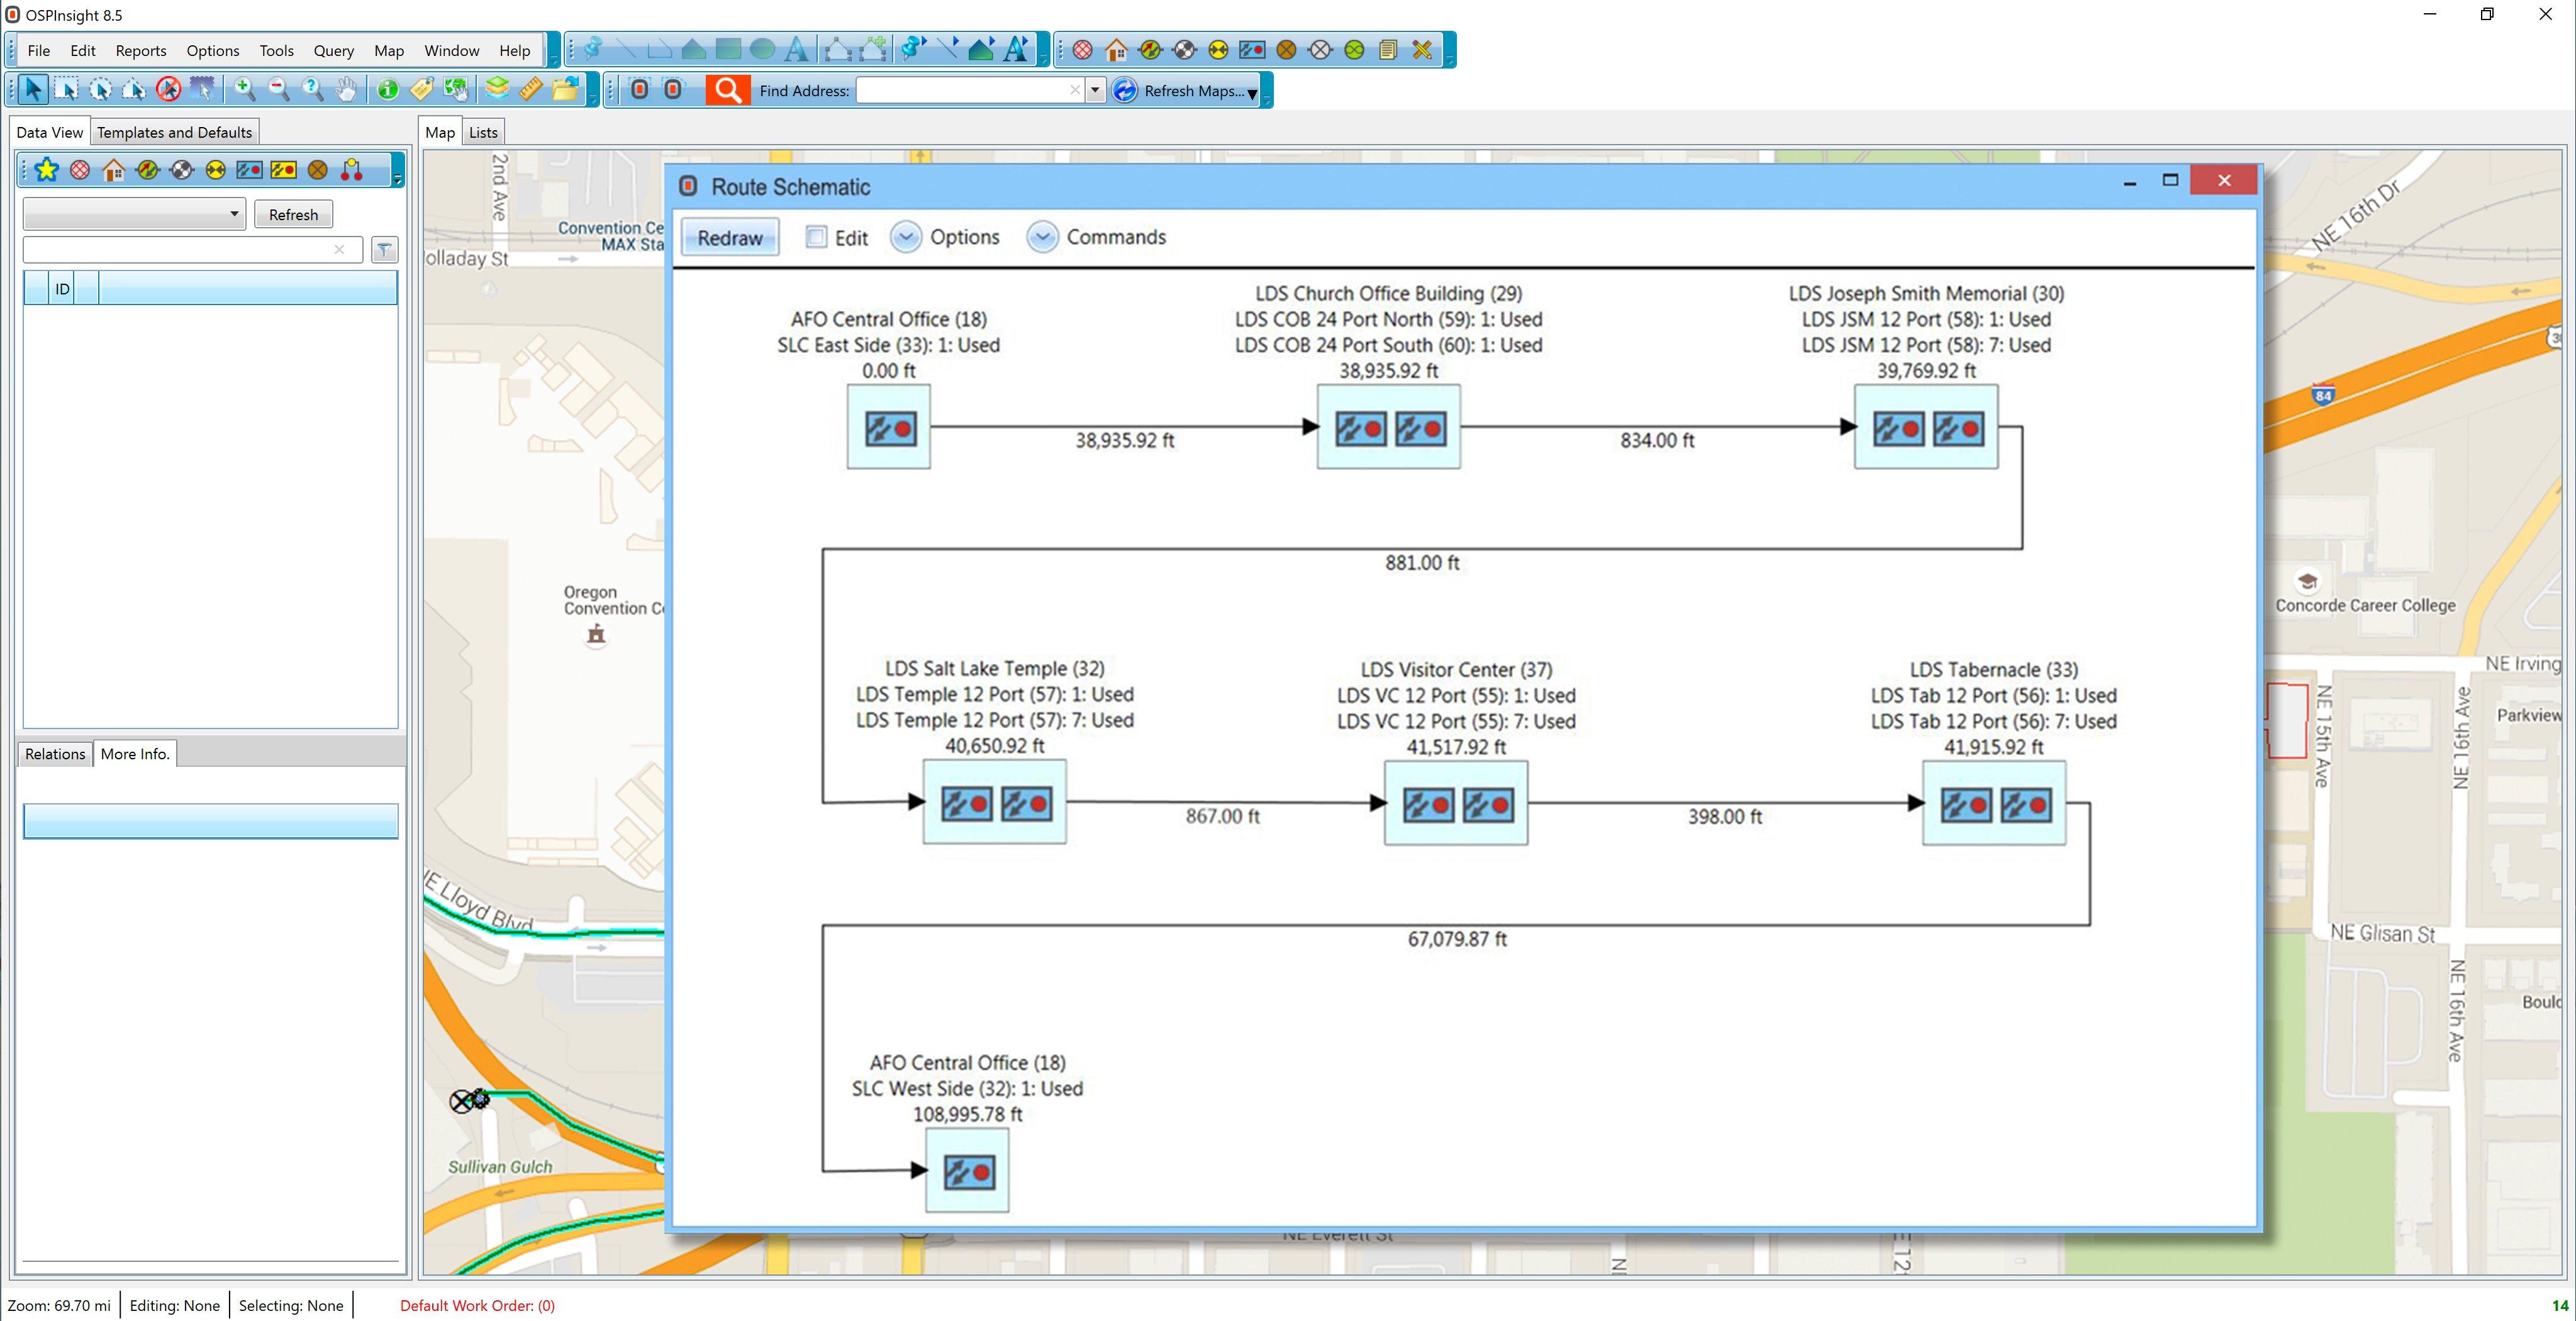 OSPInsight Desktop - Route Schematic-1